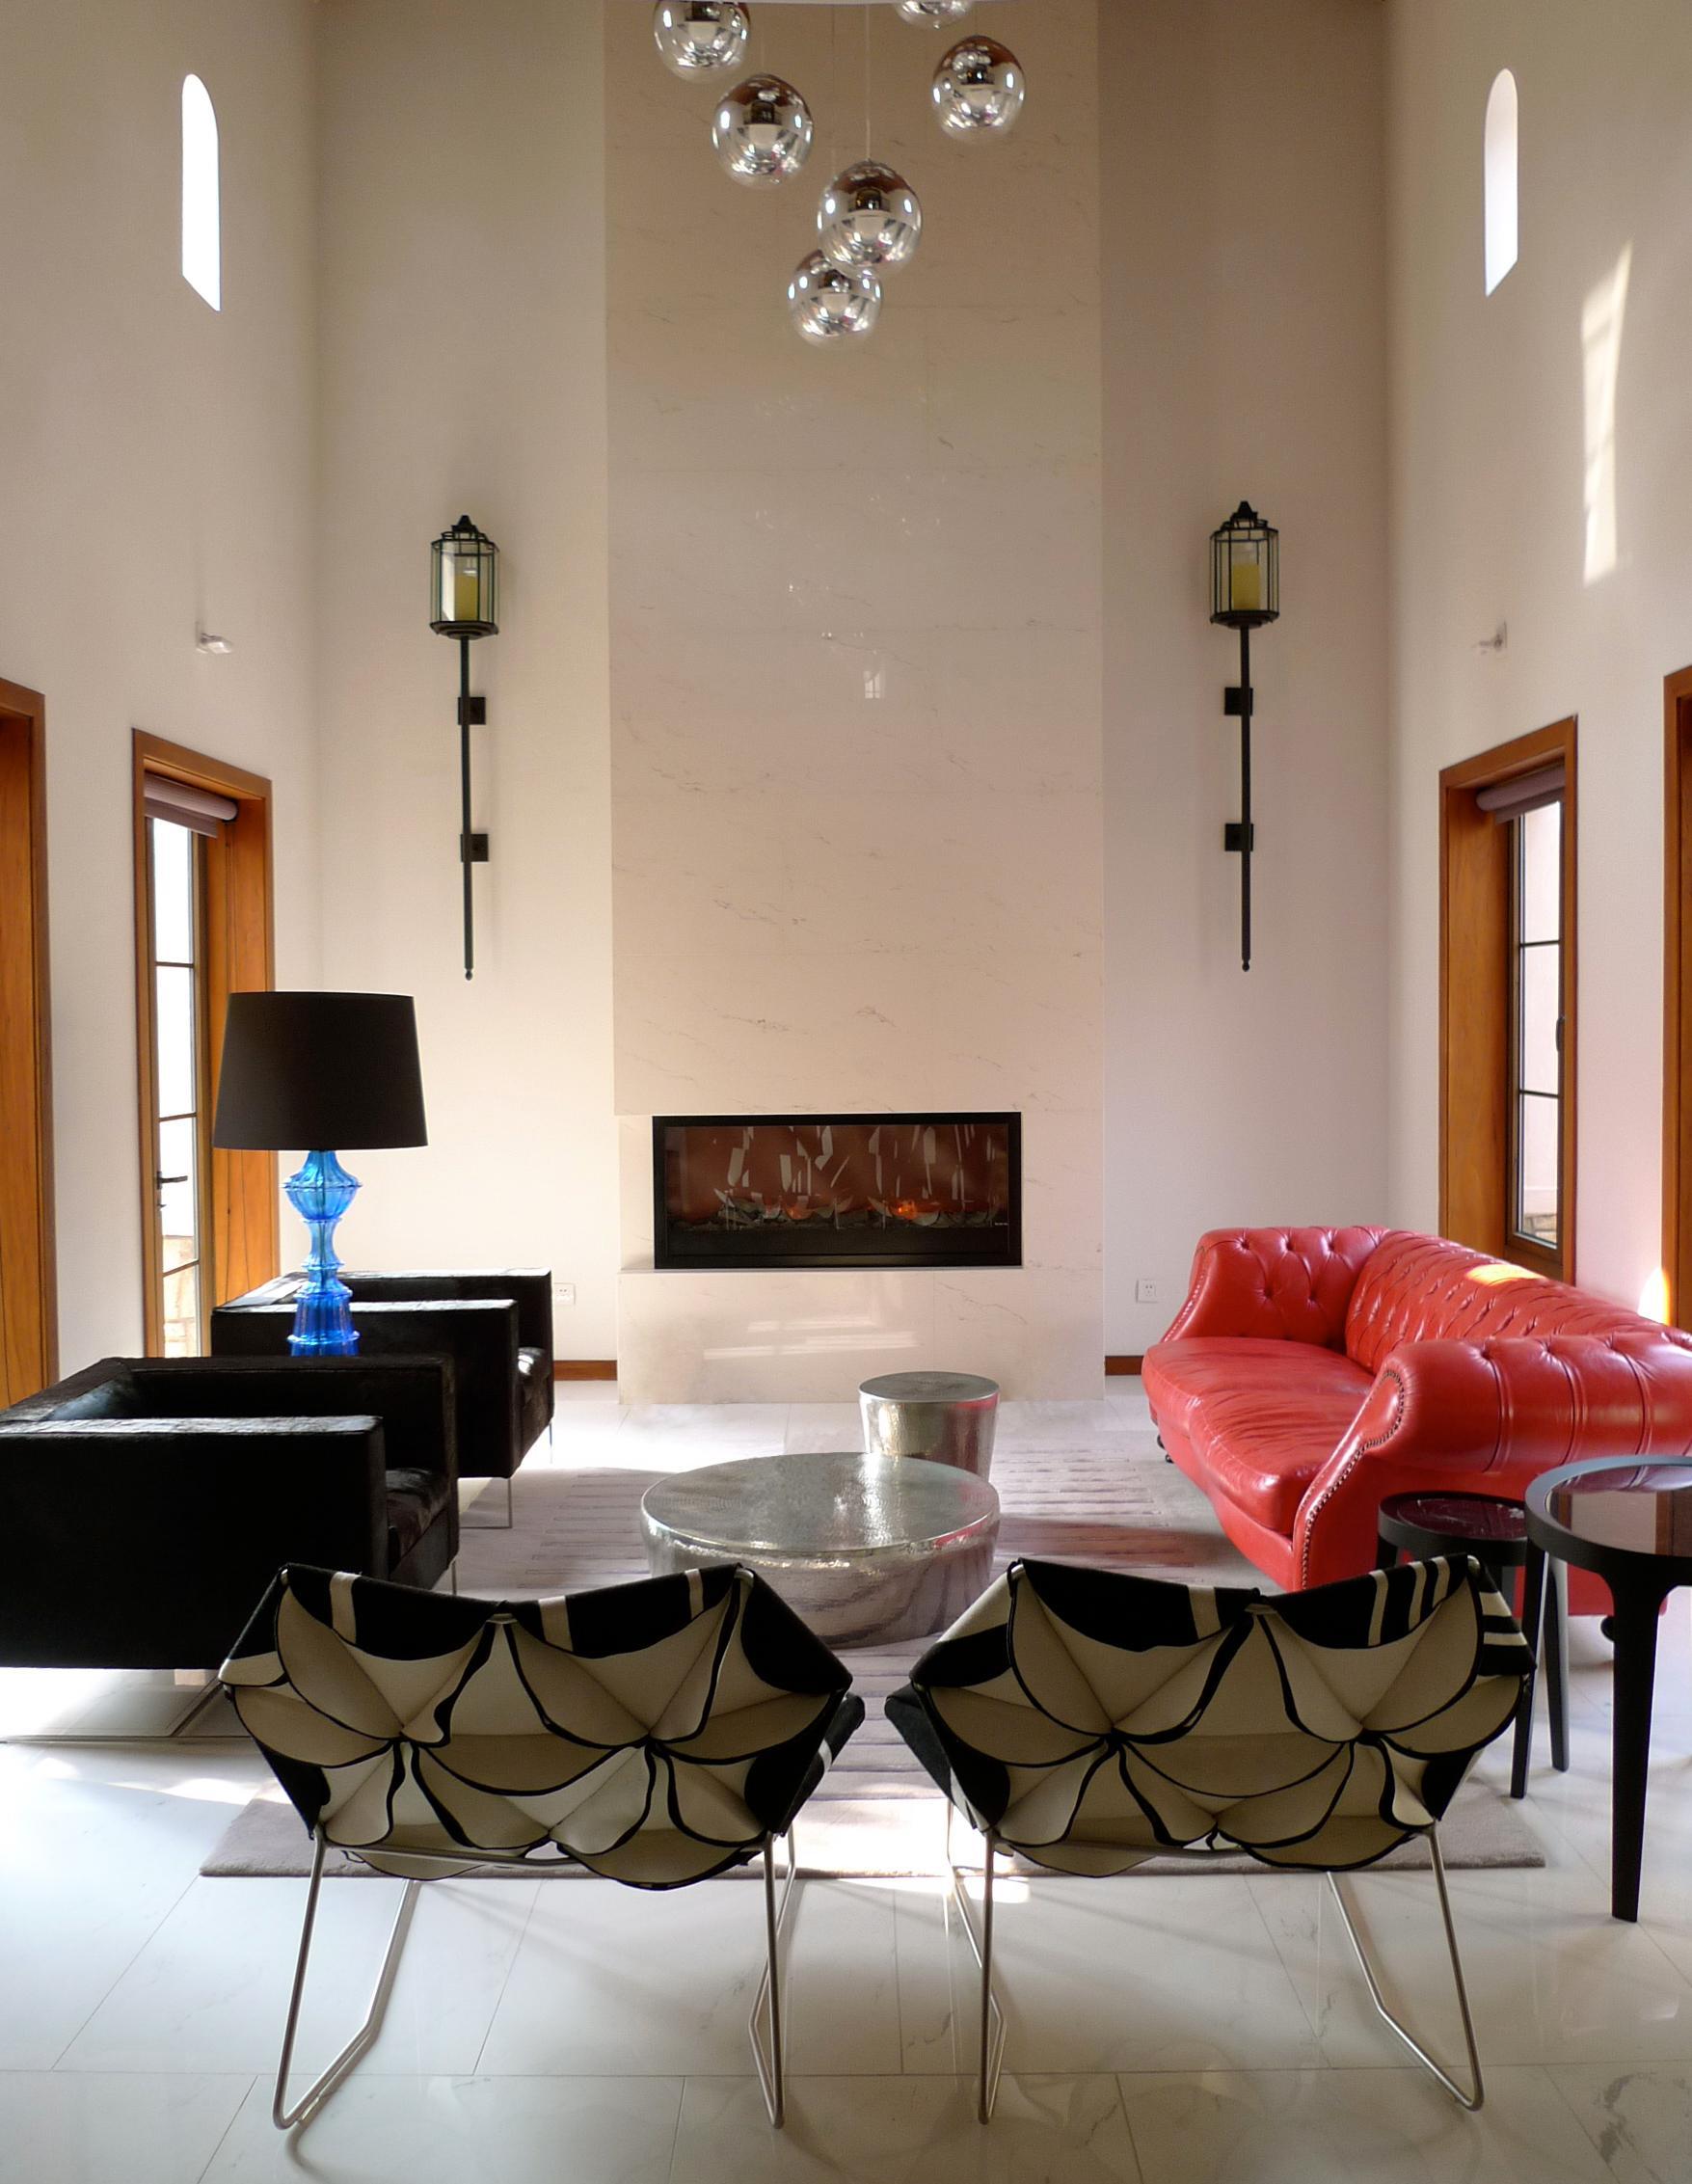 Chesterfield Sofa Bilder Ideen Couch